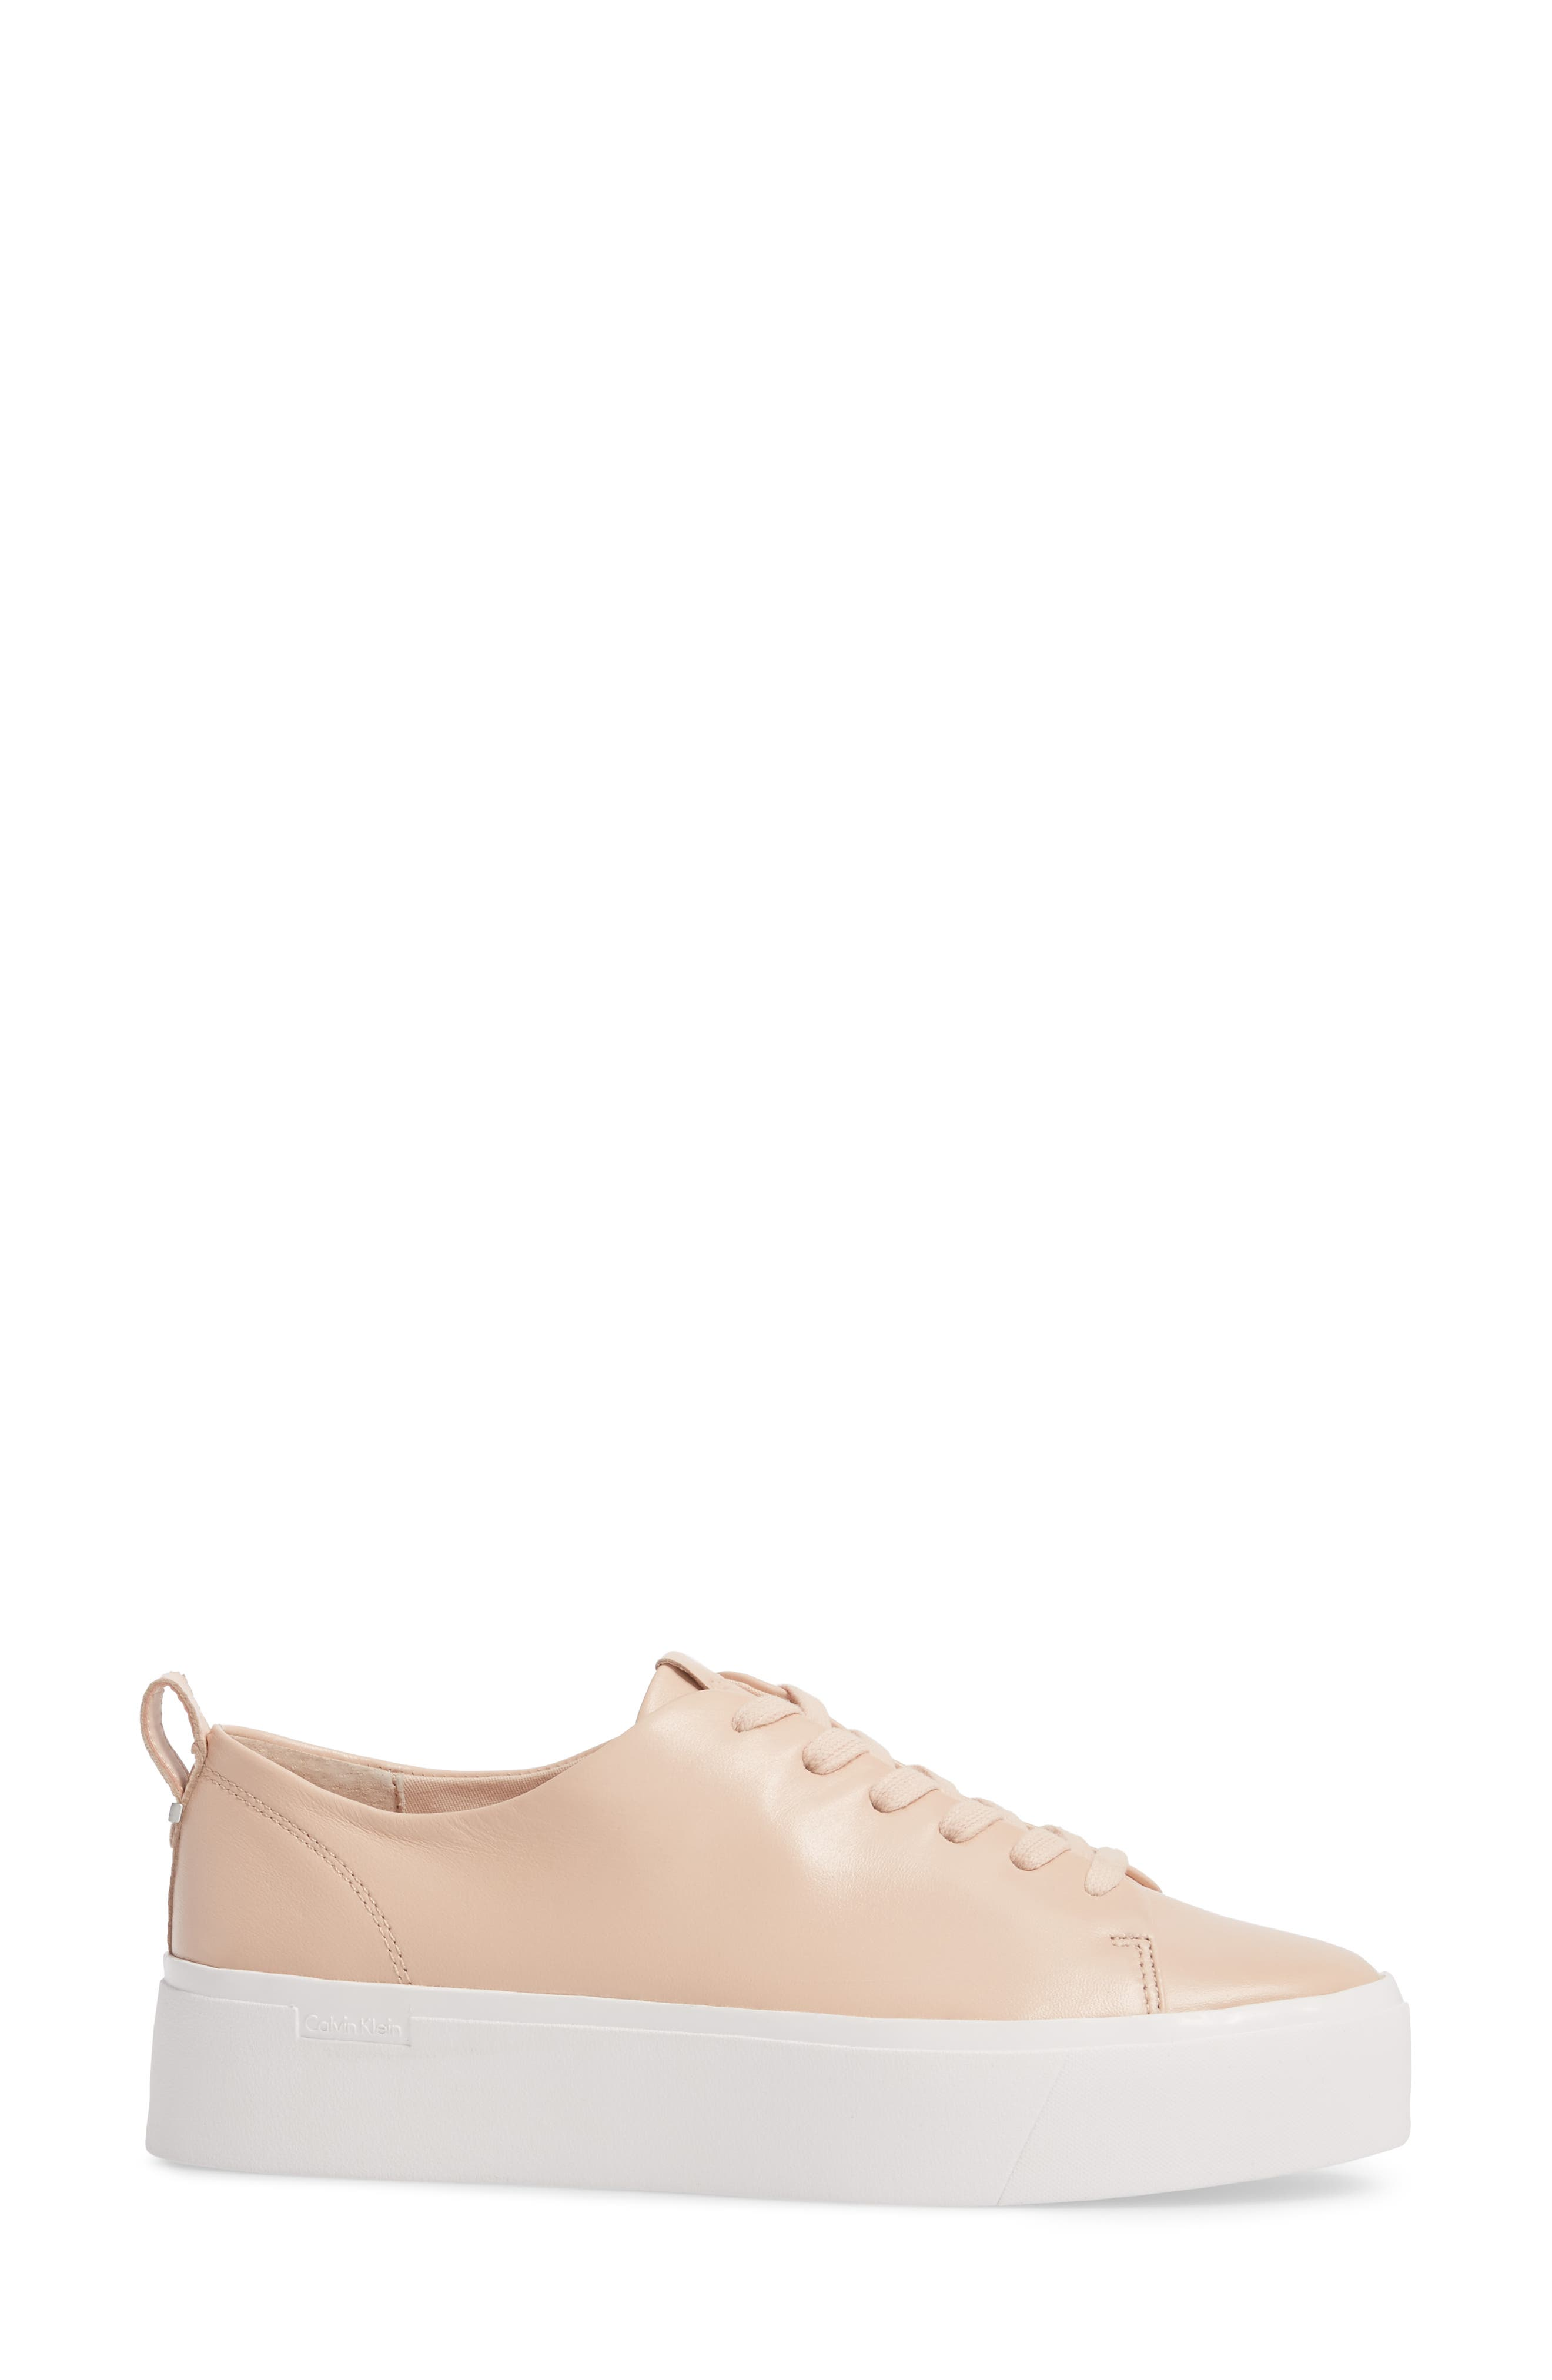 Janet Platform Sneaker,                             Alternate thumbnail 3, color,                             Pink Leather